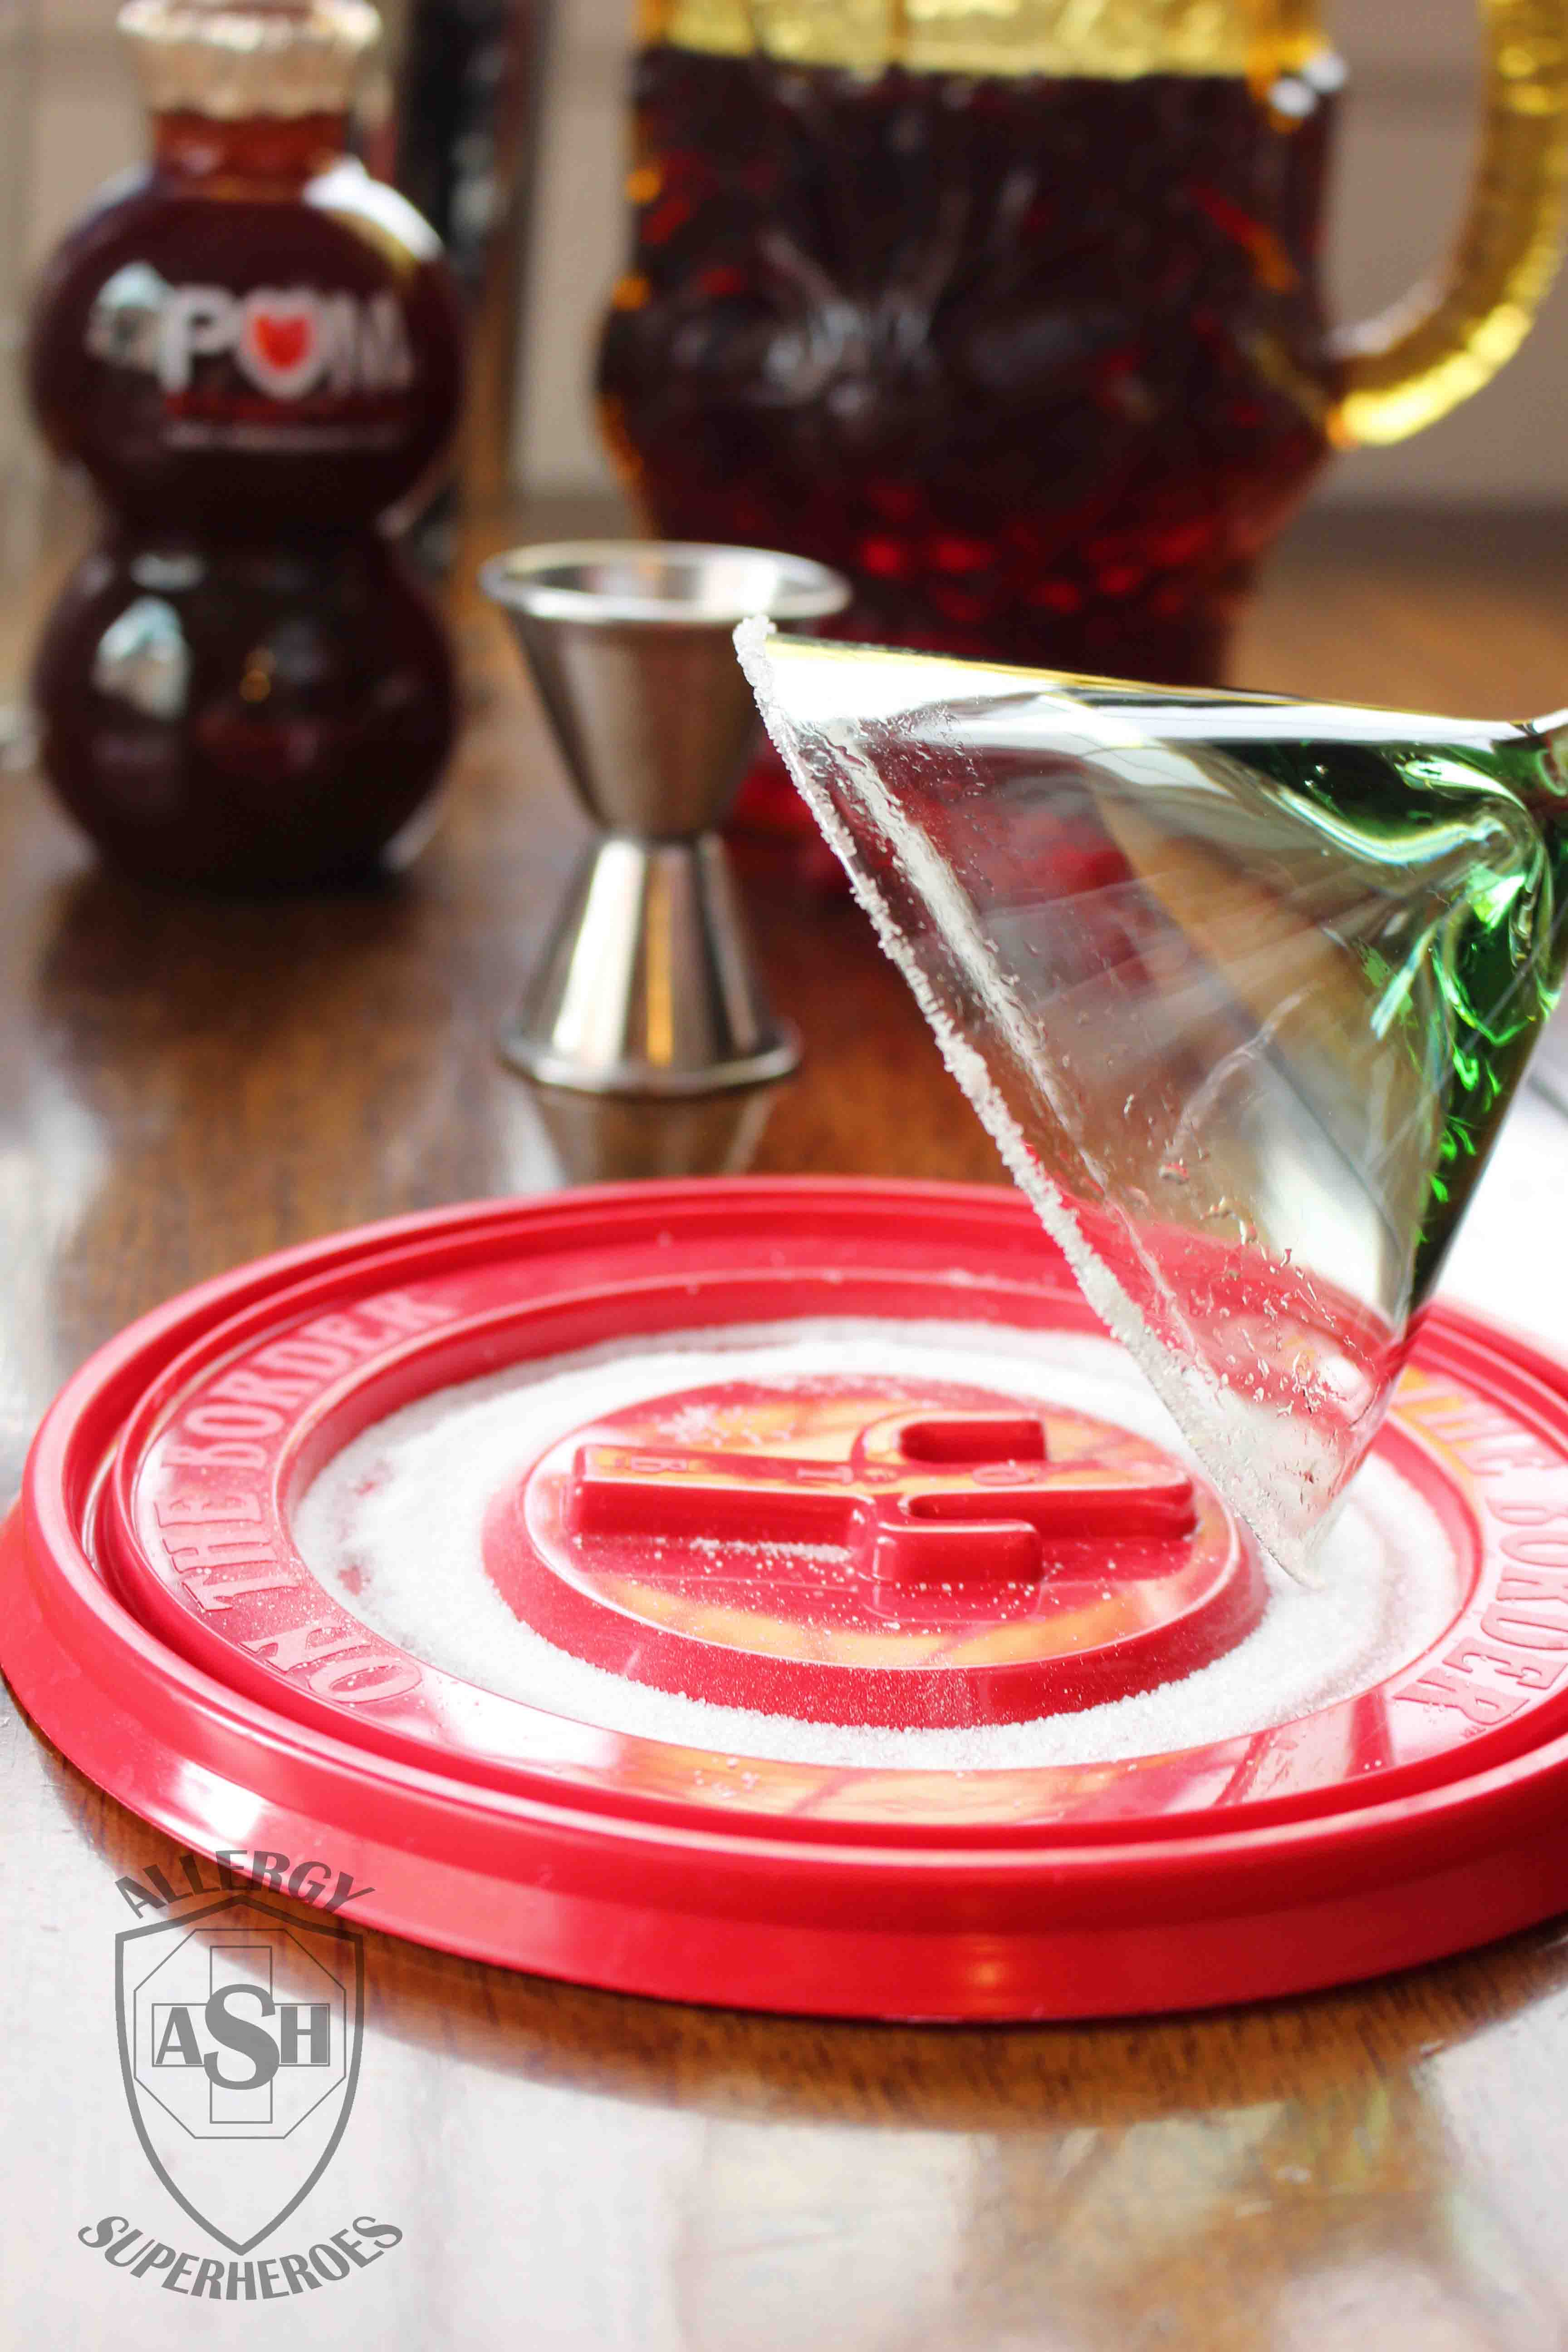 Pomegranate Martini recipe Food Allergy Superheroes 03